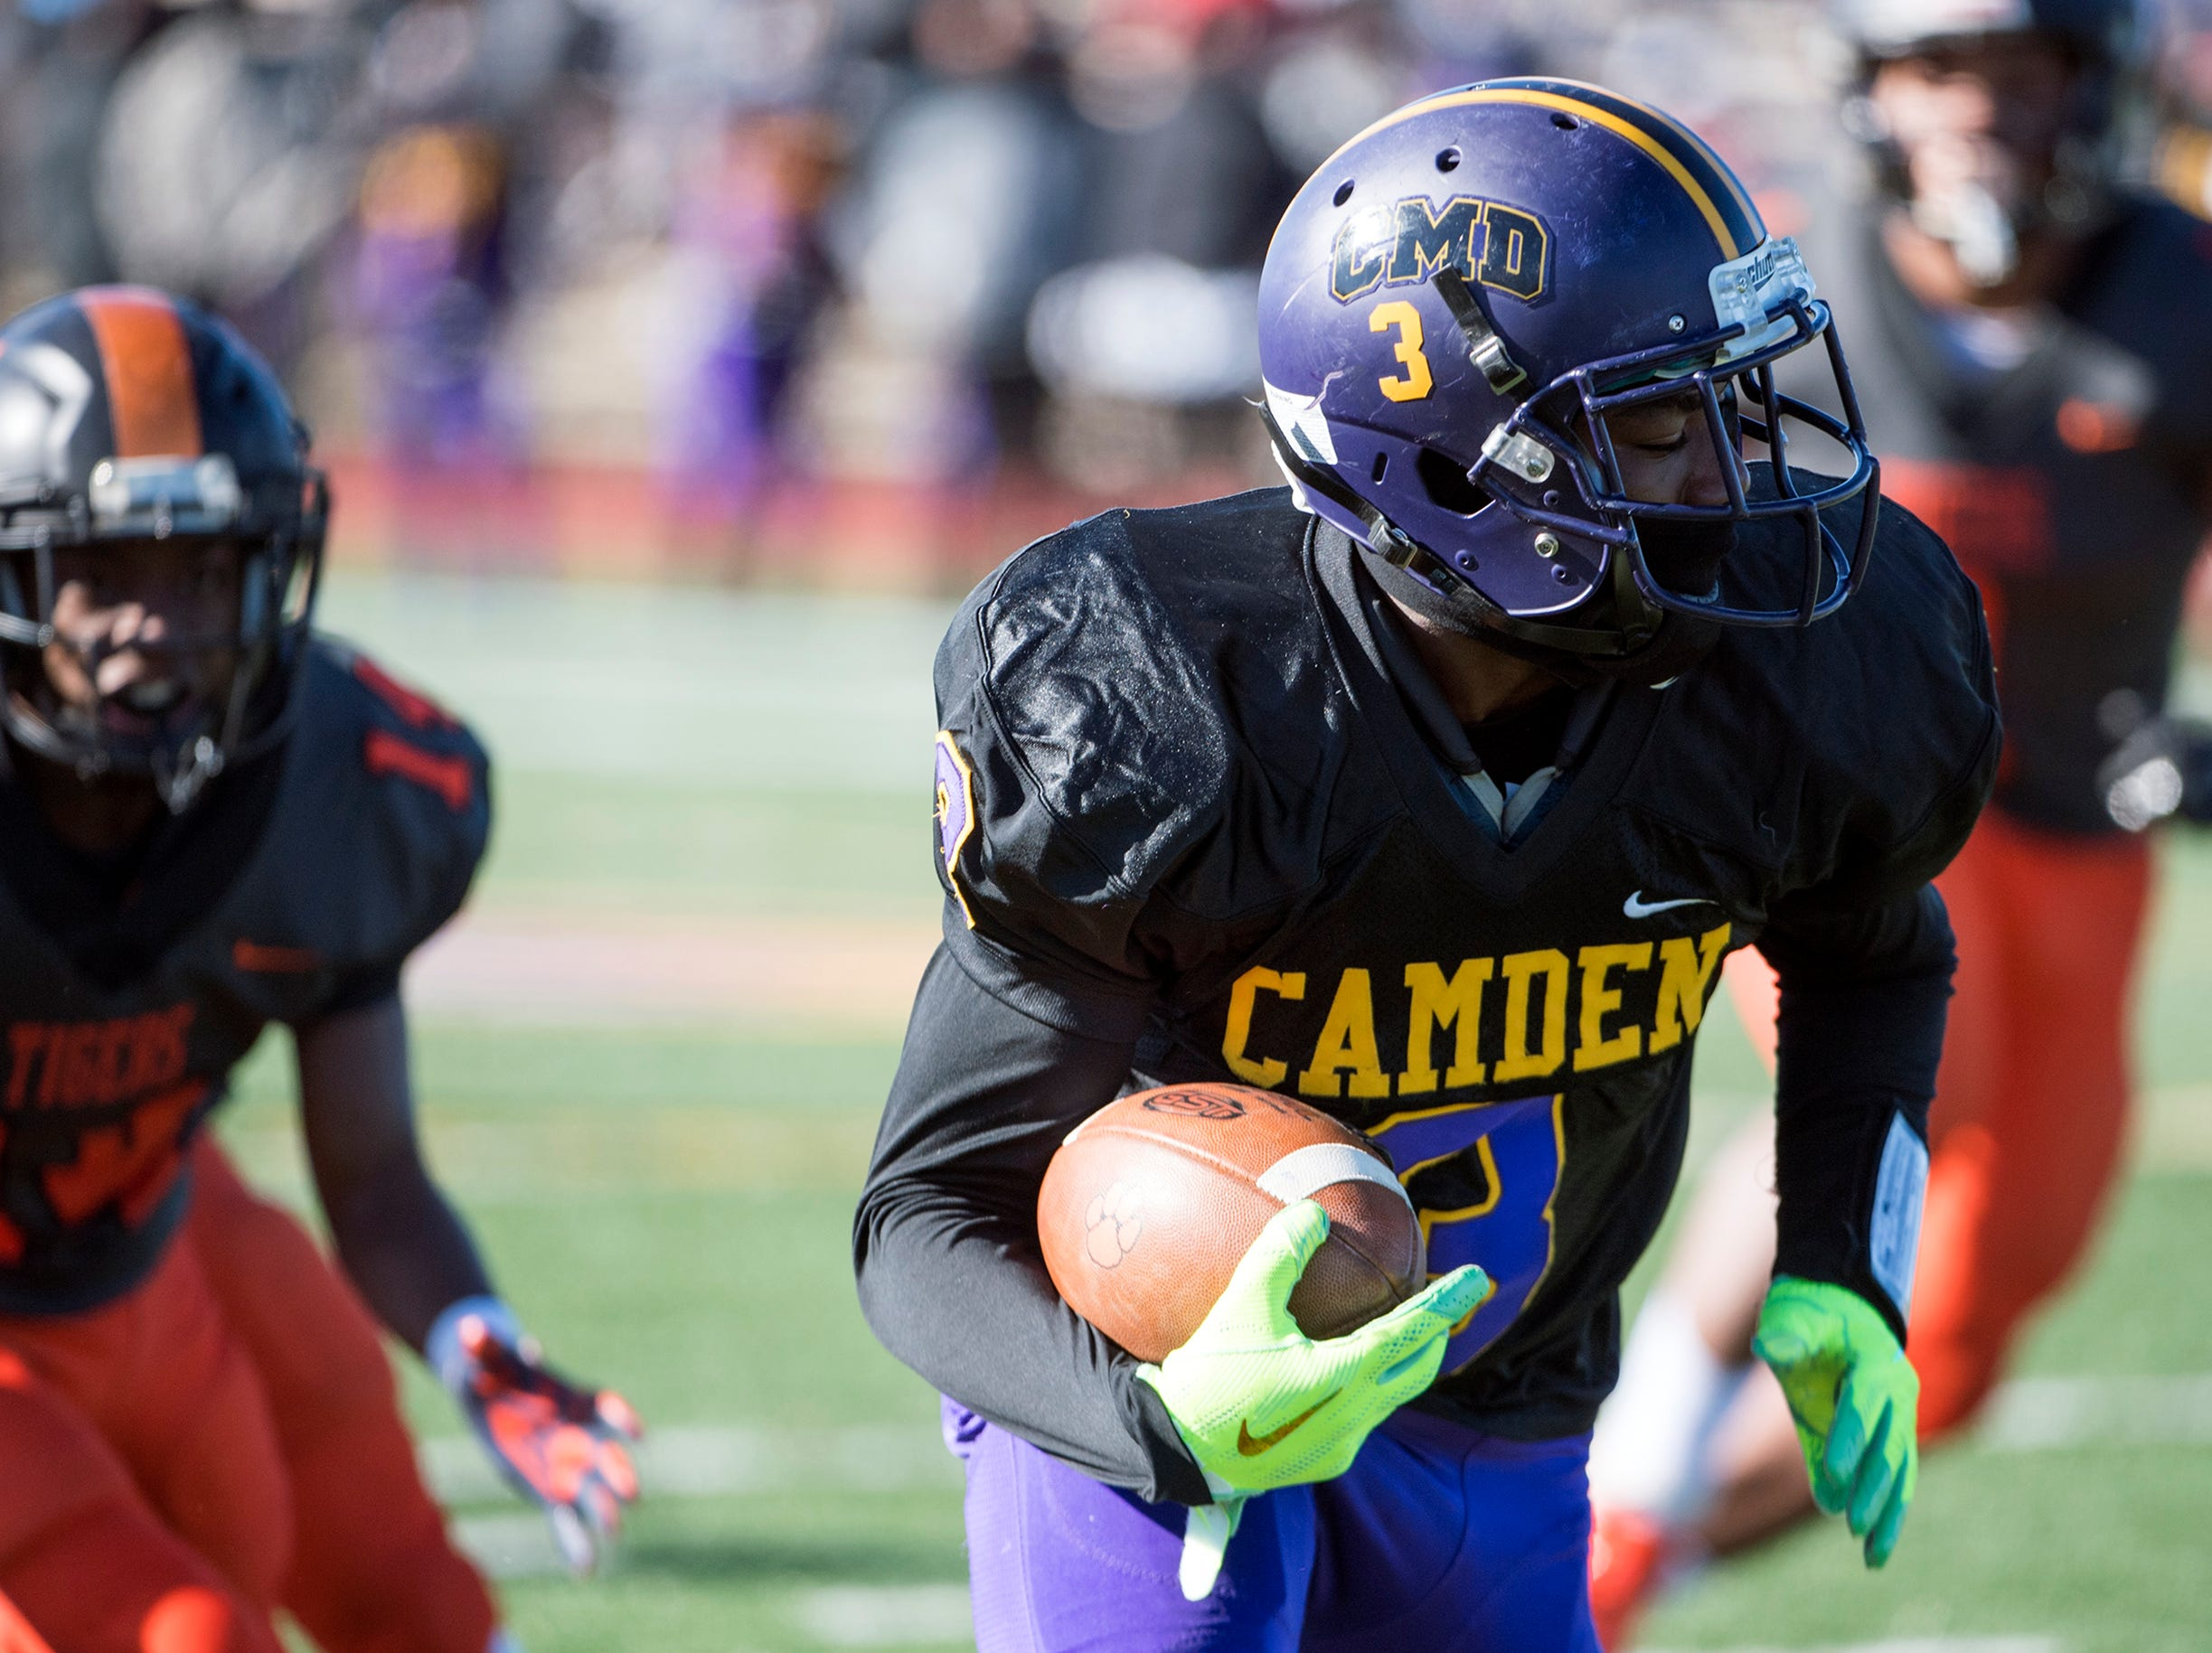 Camden's Darian ÒDuceÓ Chestnut (3) carries during an annual Camden-Woodrow Wilson Thanksgiving game Thursday, Nov. 22, 2018 in Camden, N.J. Camden won 39-28.